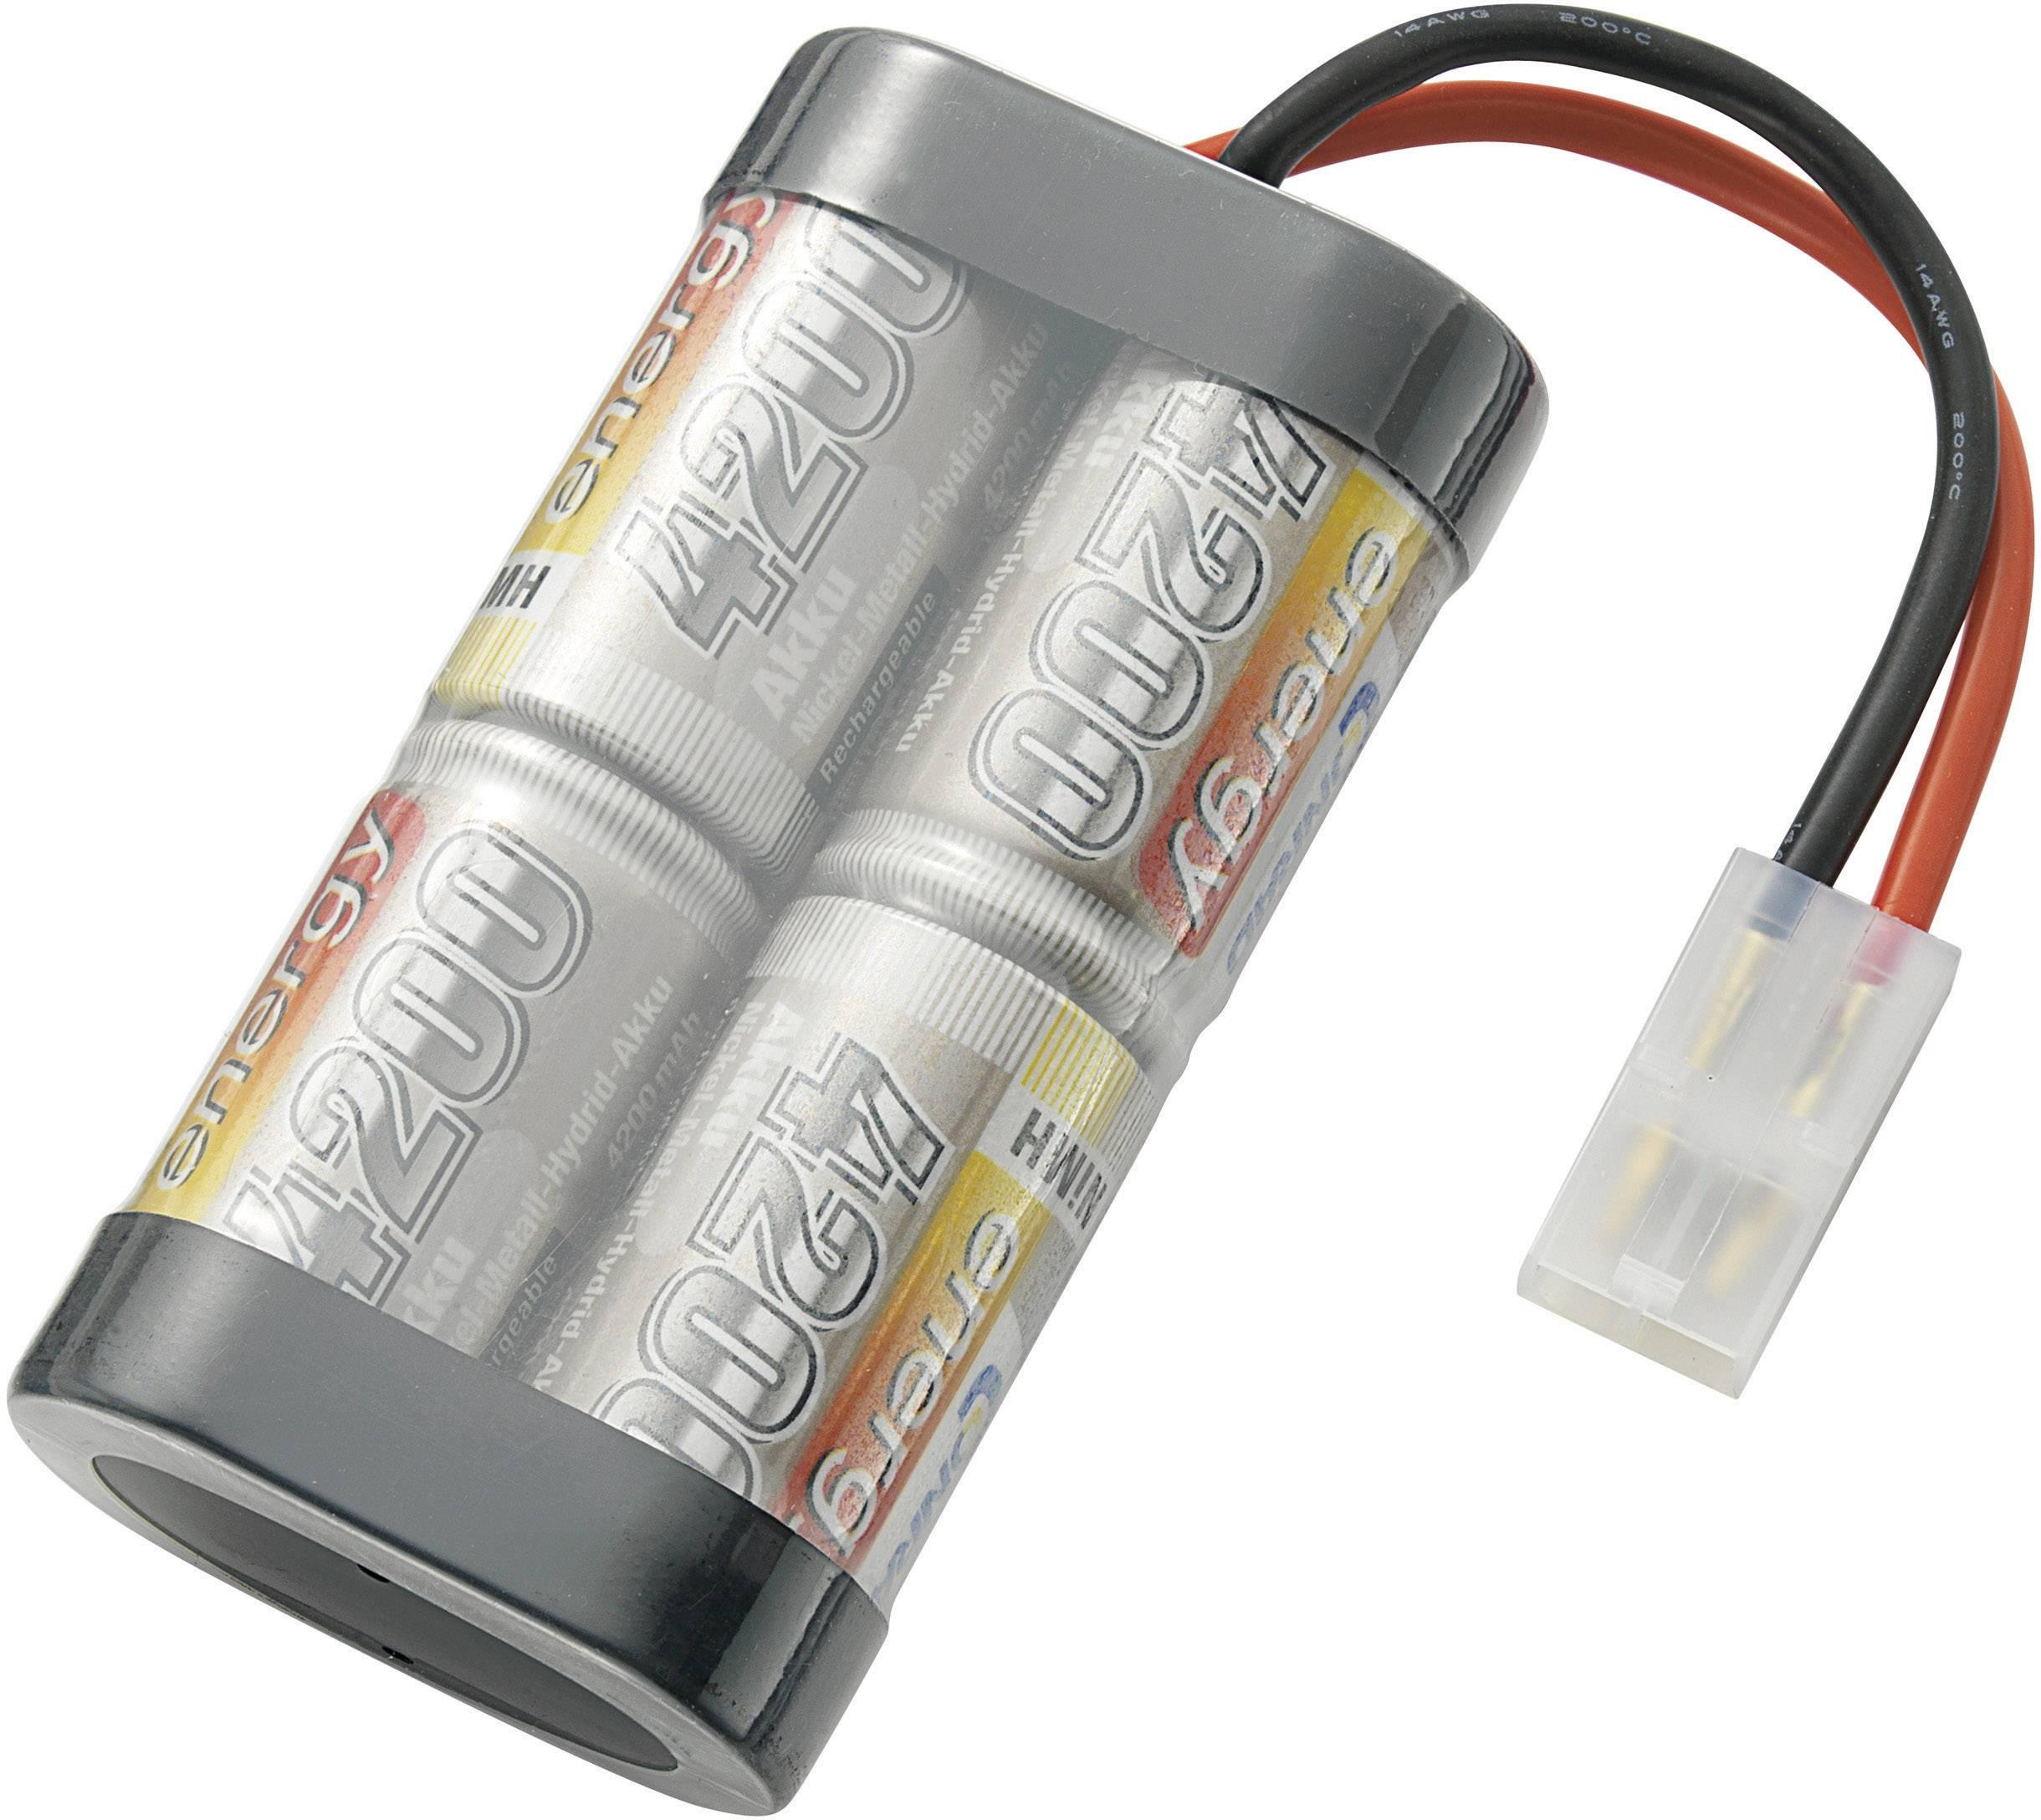 Akupack NiMH (modelářství) Conrad energy SC 4200MAH 4.8V, 4.8 V, 4200 mAh